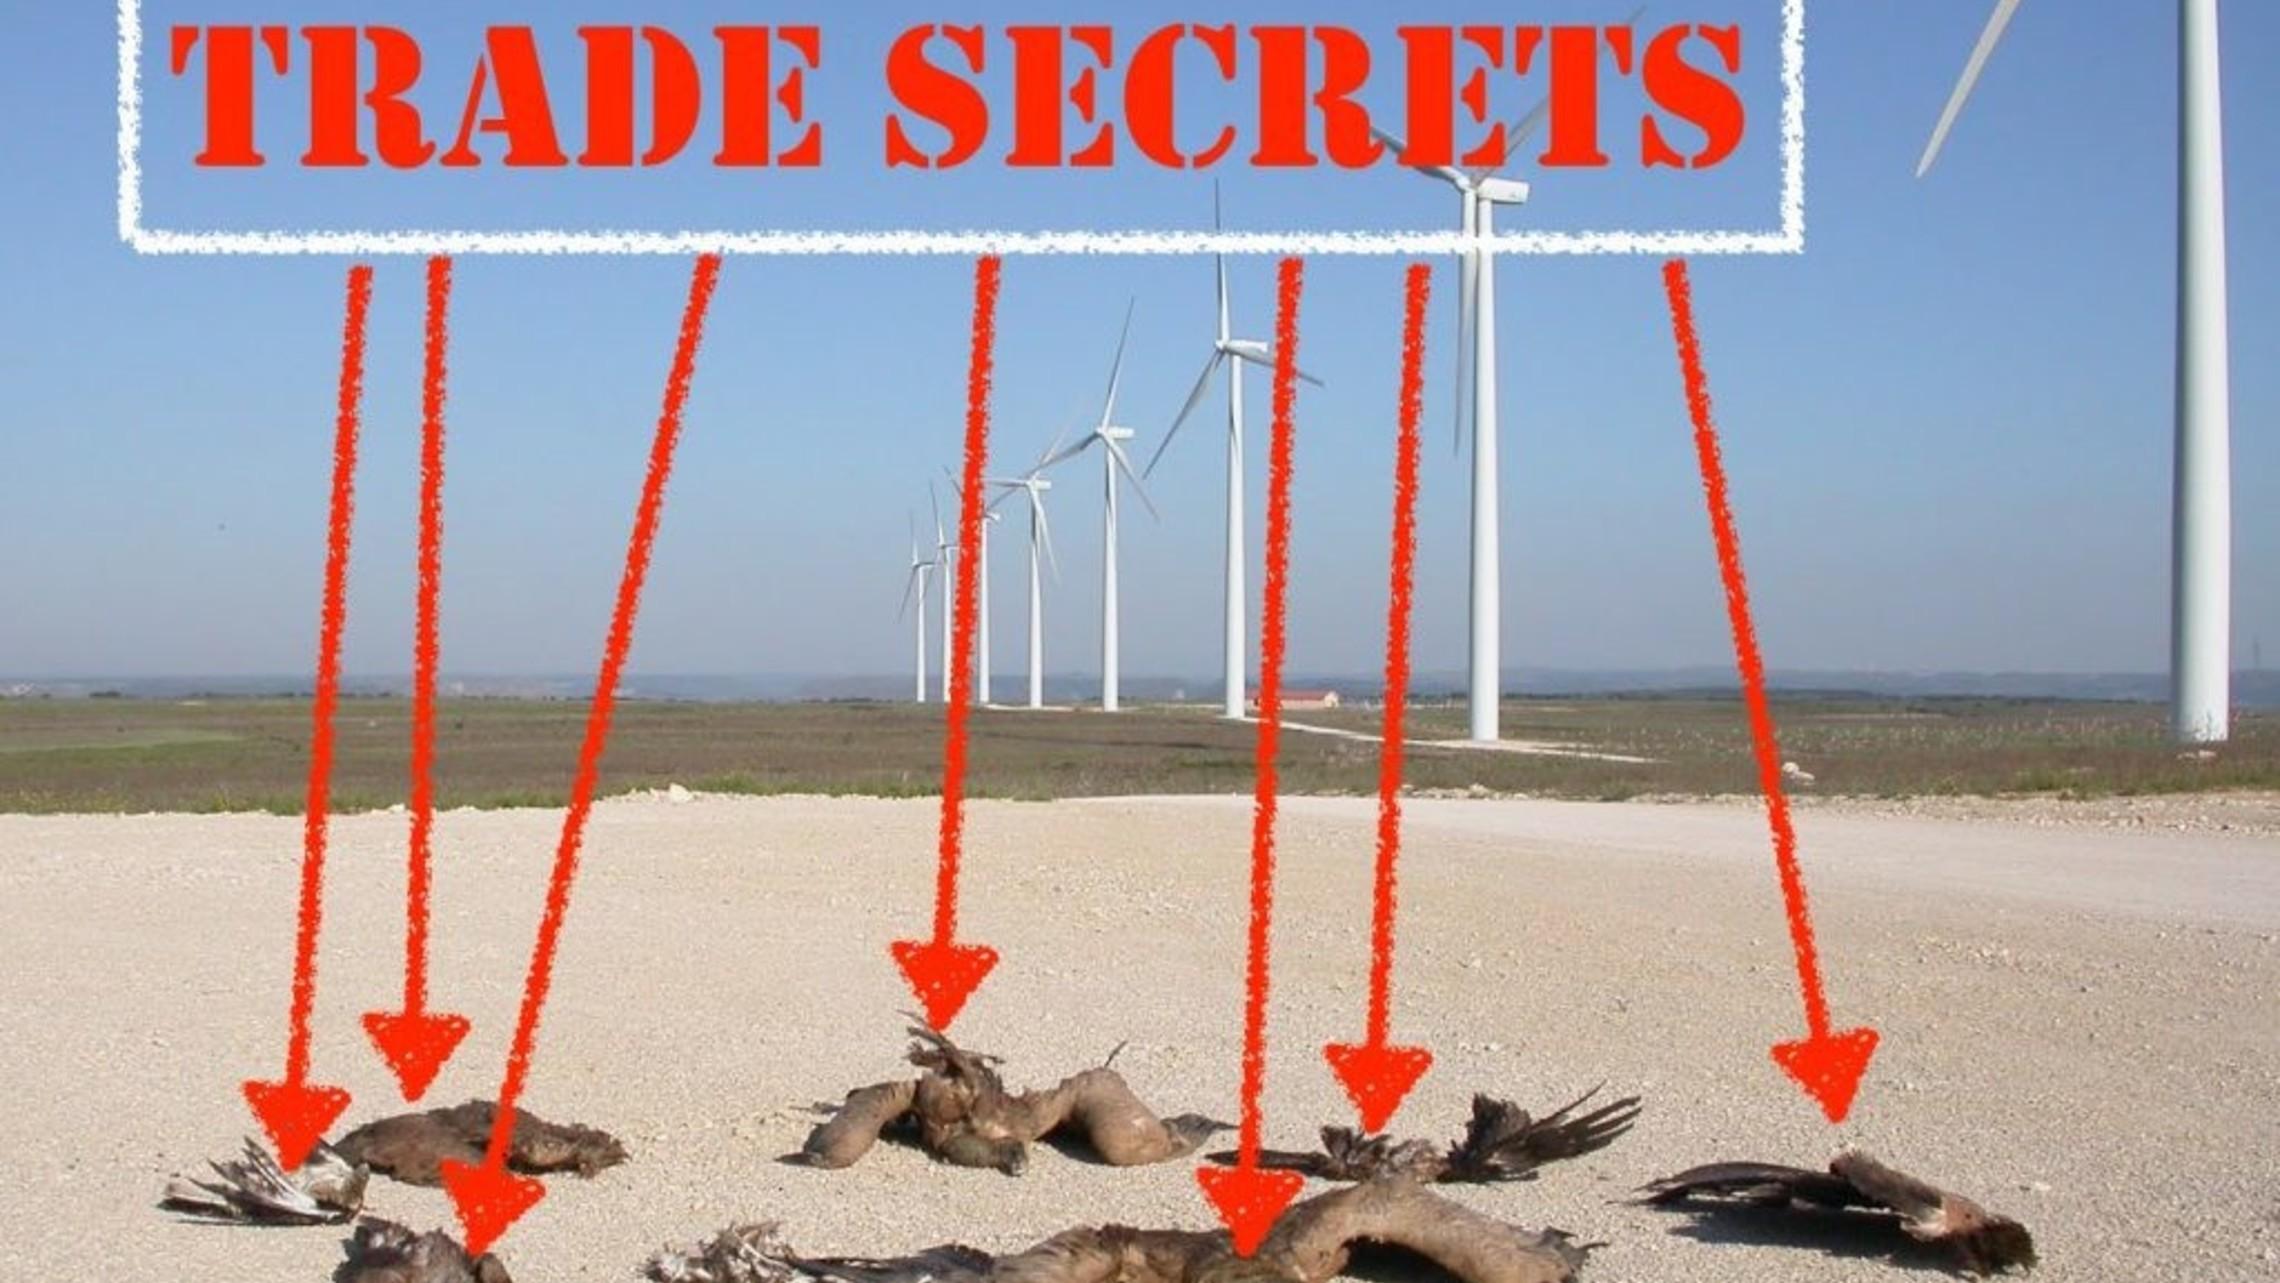 Trade Secrets 1024x687